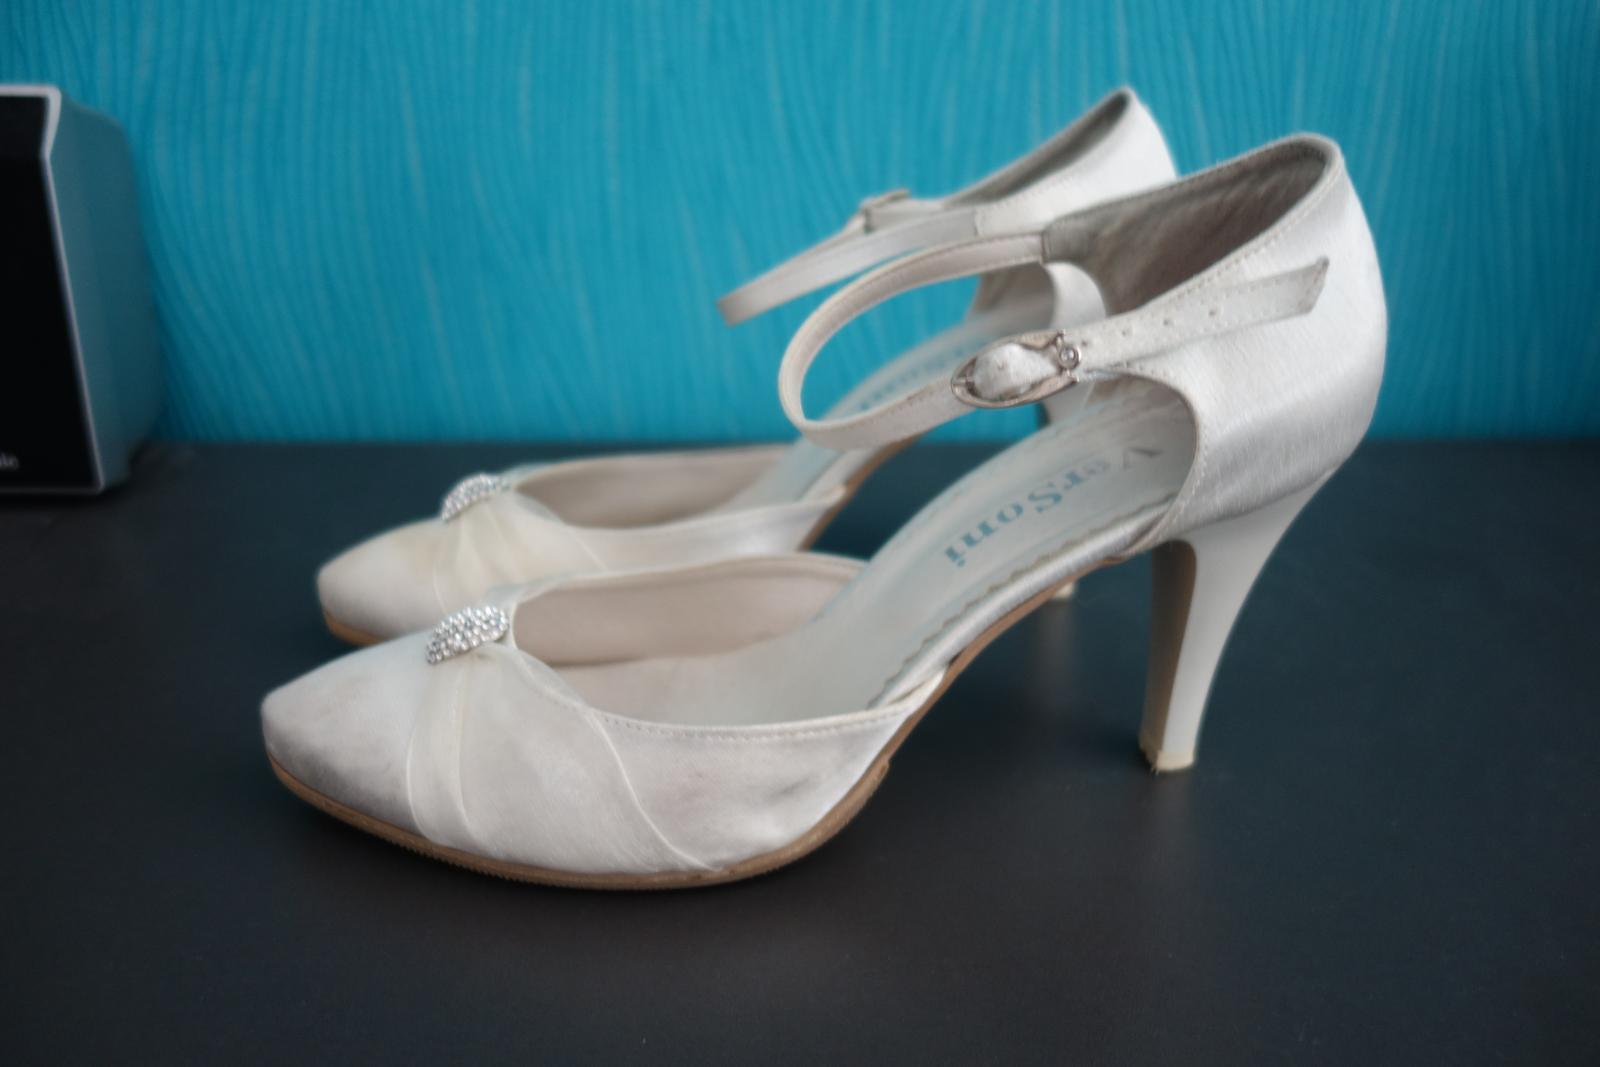 Svadobné/spoločenské topánky č. 40 - 41 - Obrázok č. 3